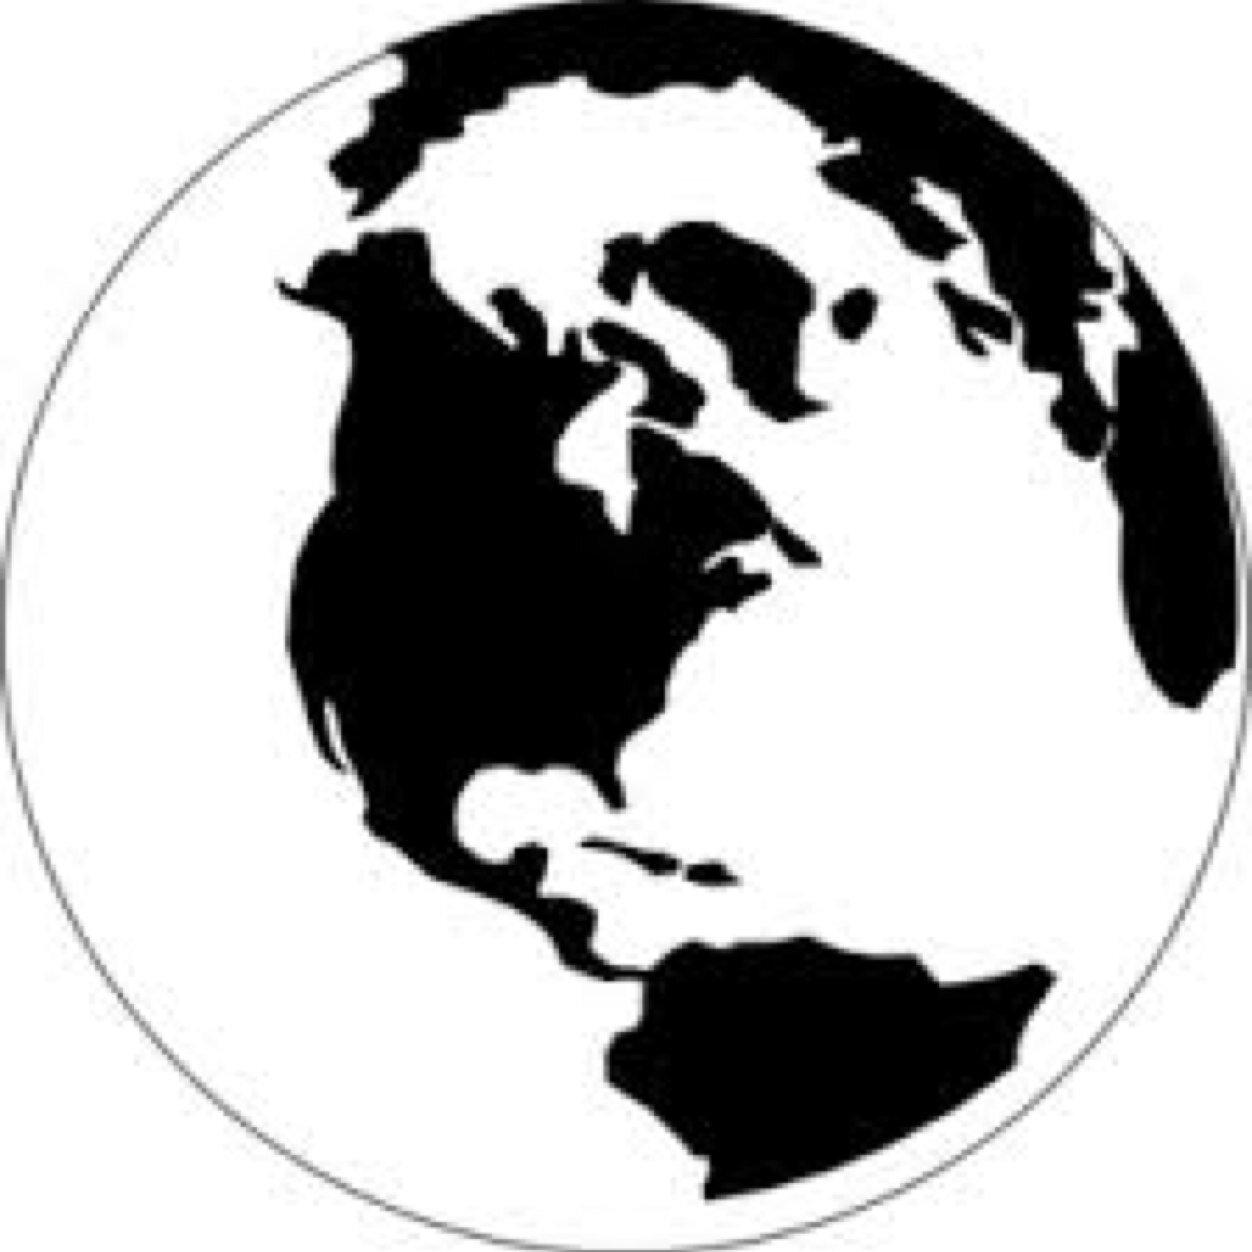 Twitter globe clipart banner transparent library YMMH Clothing (@YMMH___) | Twitter banner transparent library